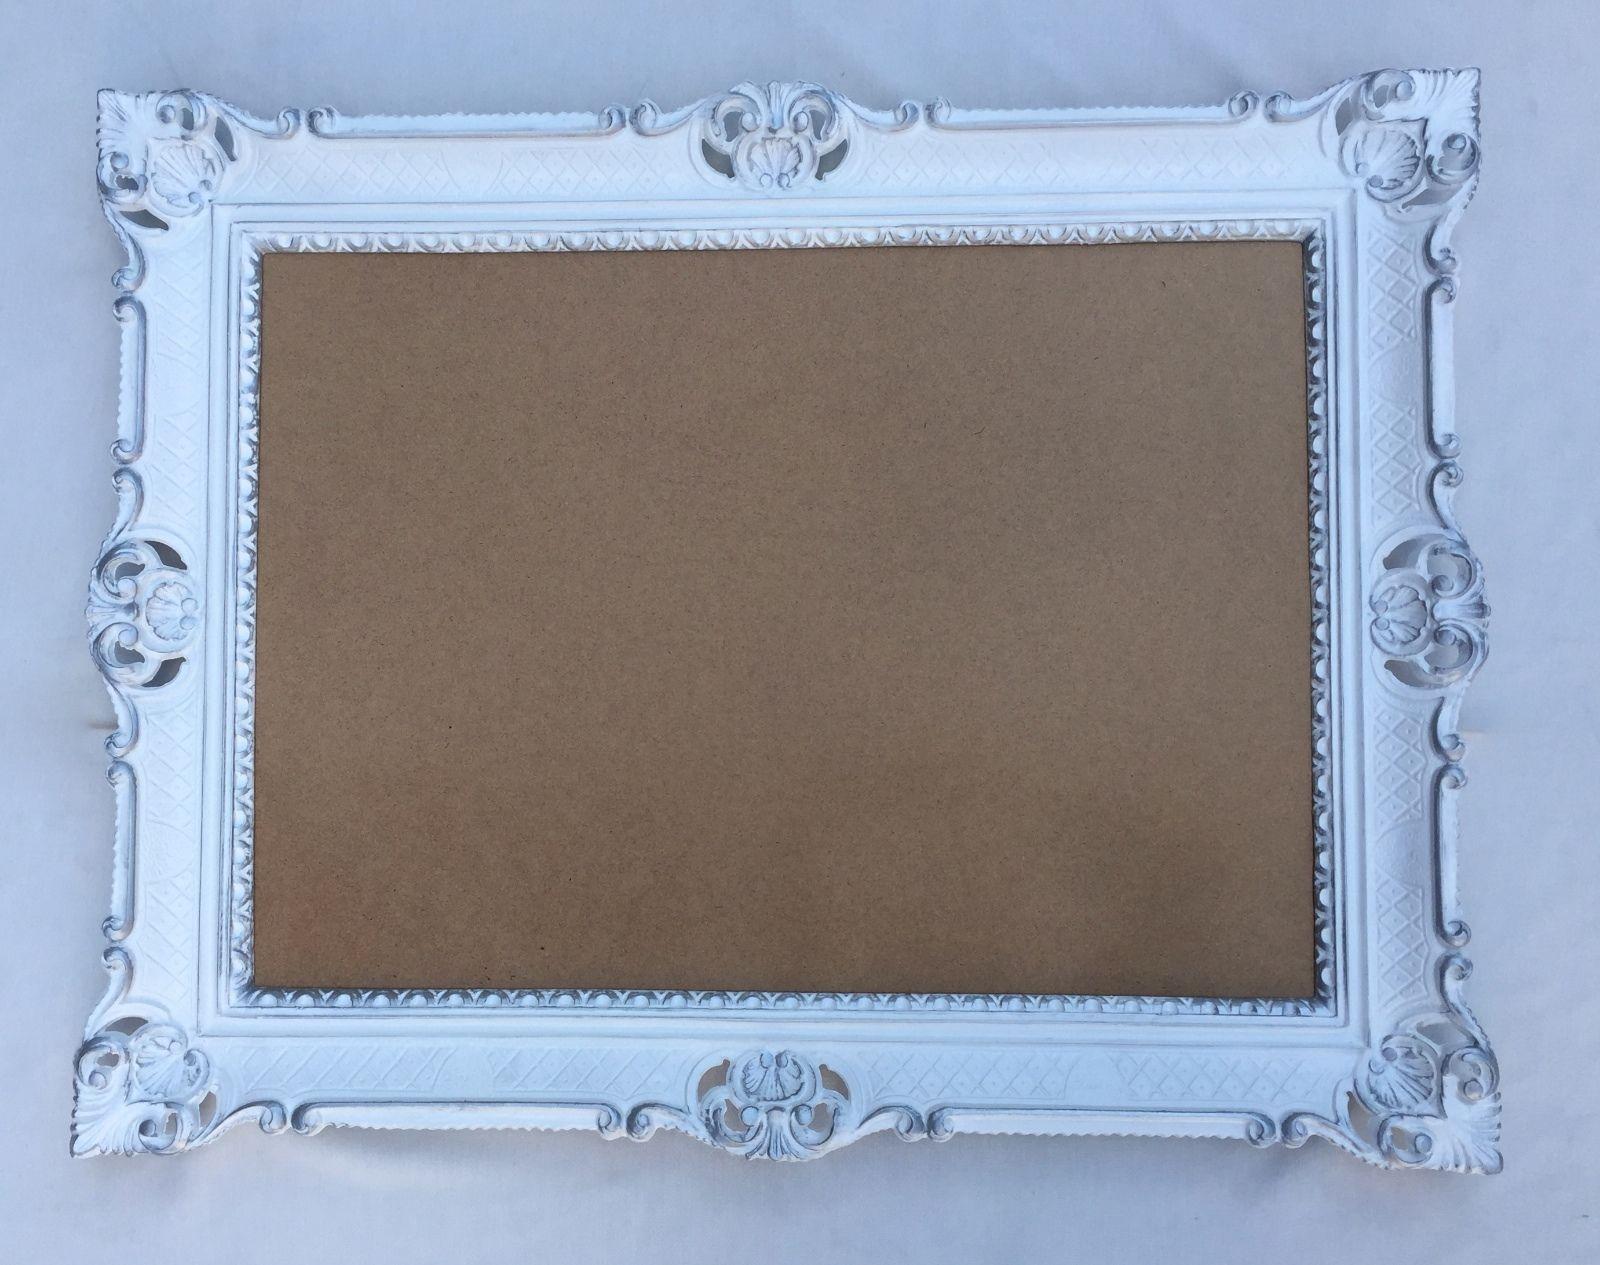 Bilderrahmen 70x90 Rahmen BAROCK Rechteckig Antik Weiß Silber ...